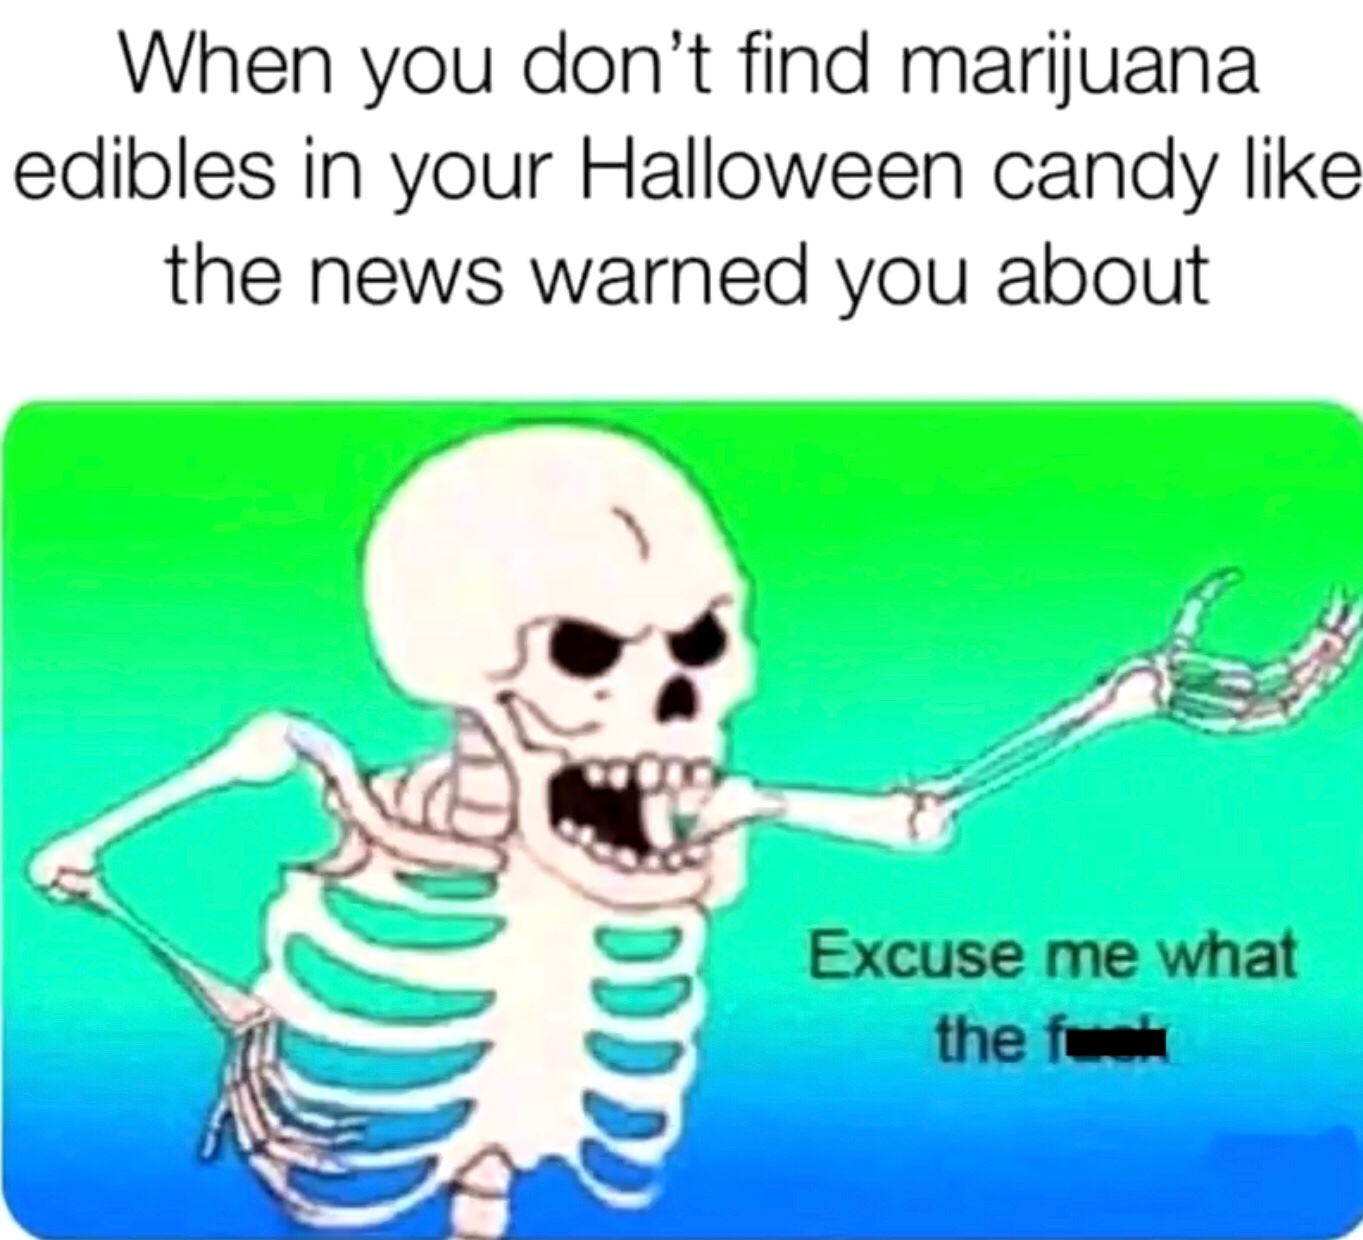 the news be lying hard bro - meme